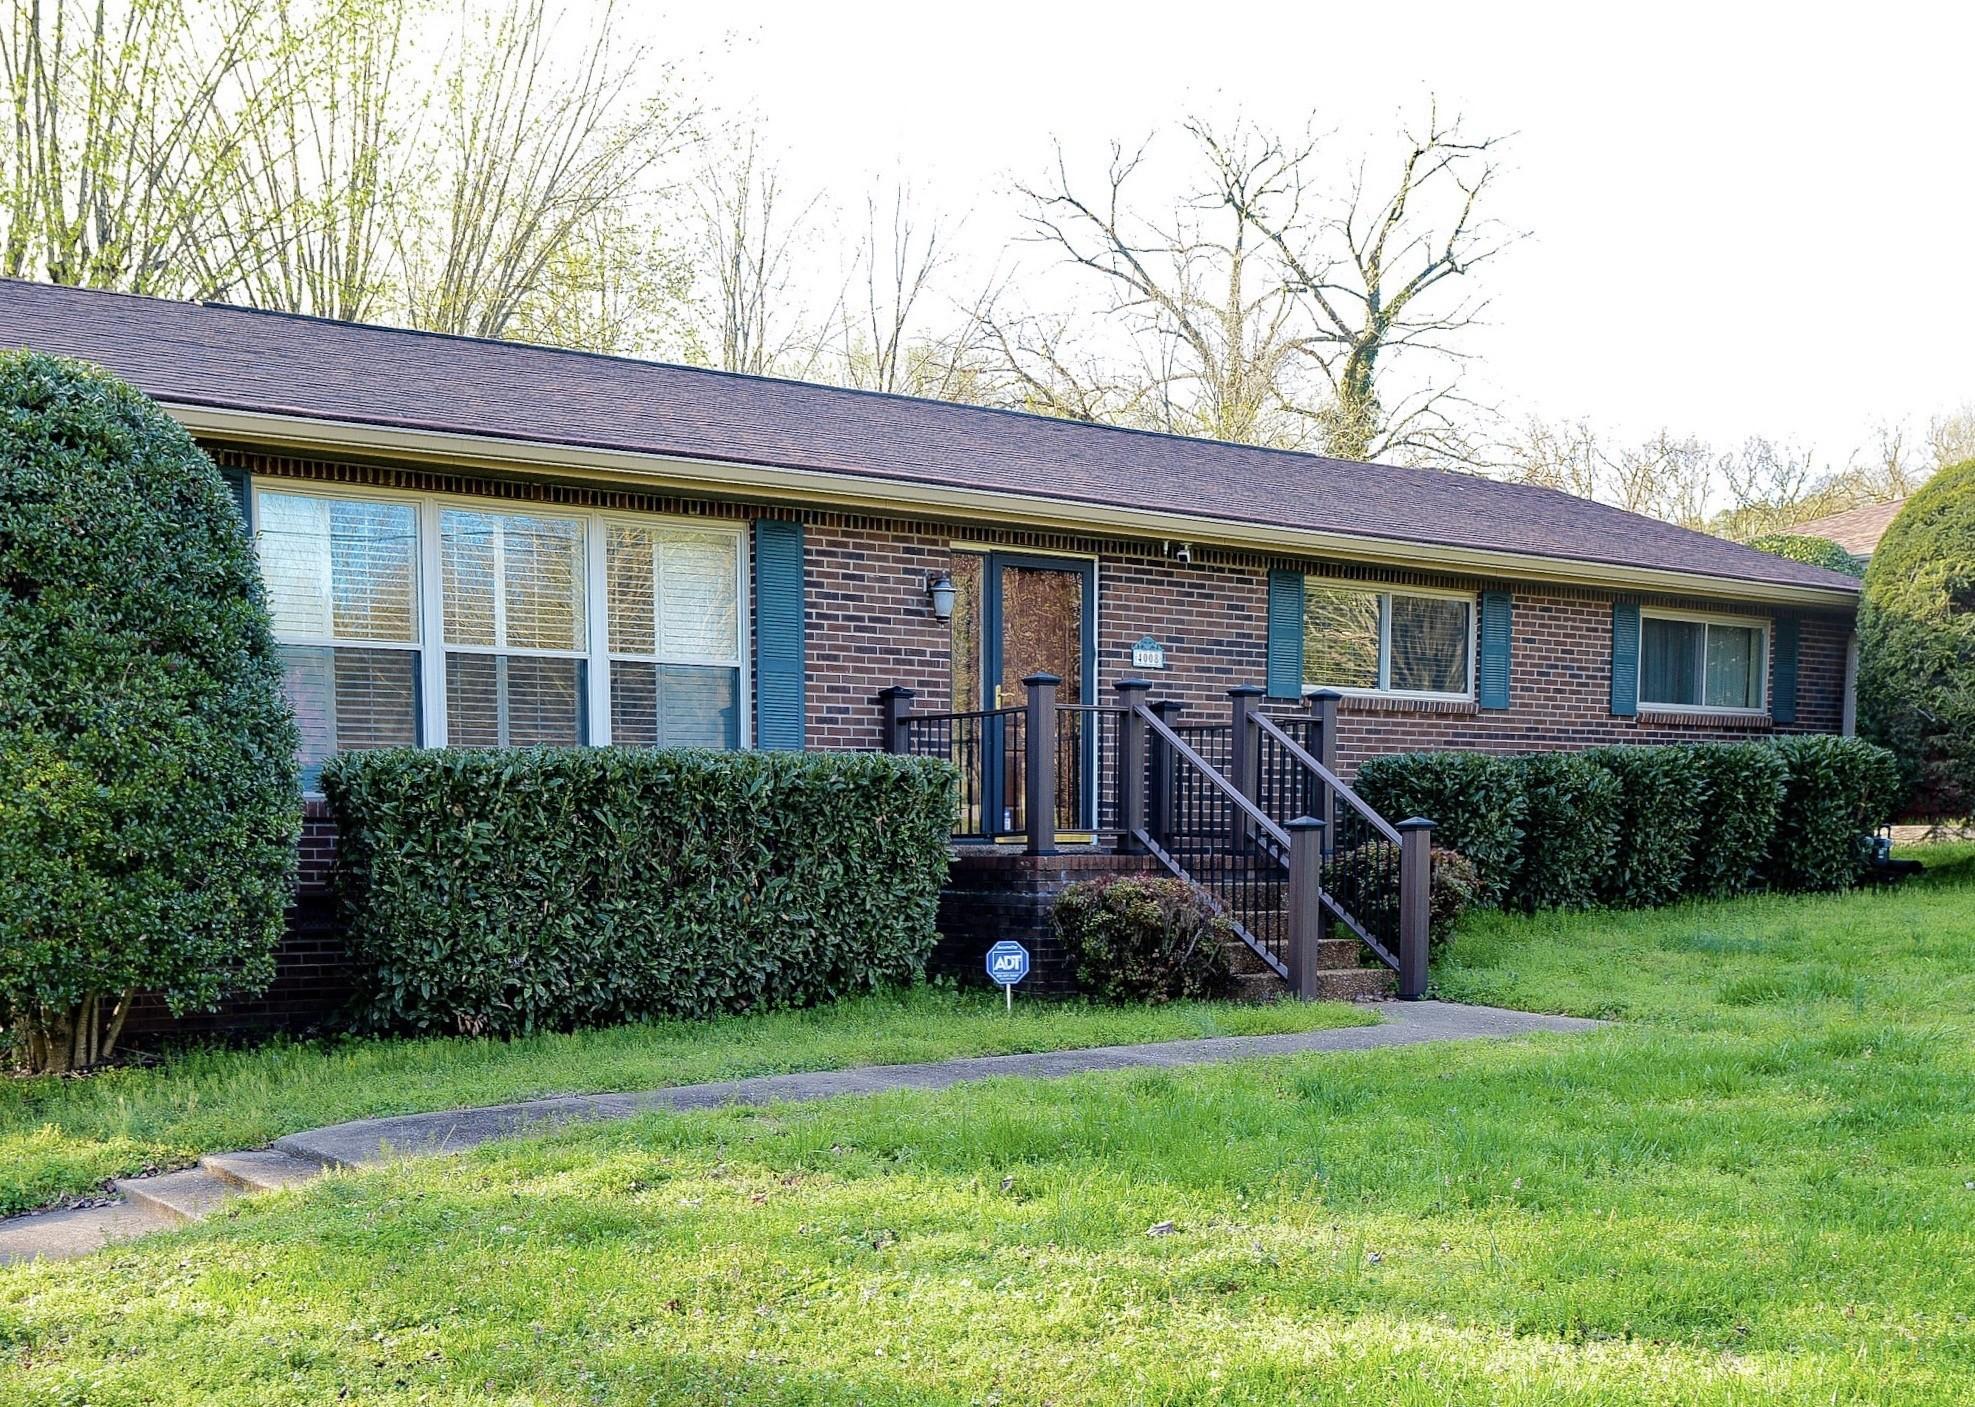 4008 Ridgemont Dr, Nashville, TN 37207 - Nashville, TN real estate listing